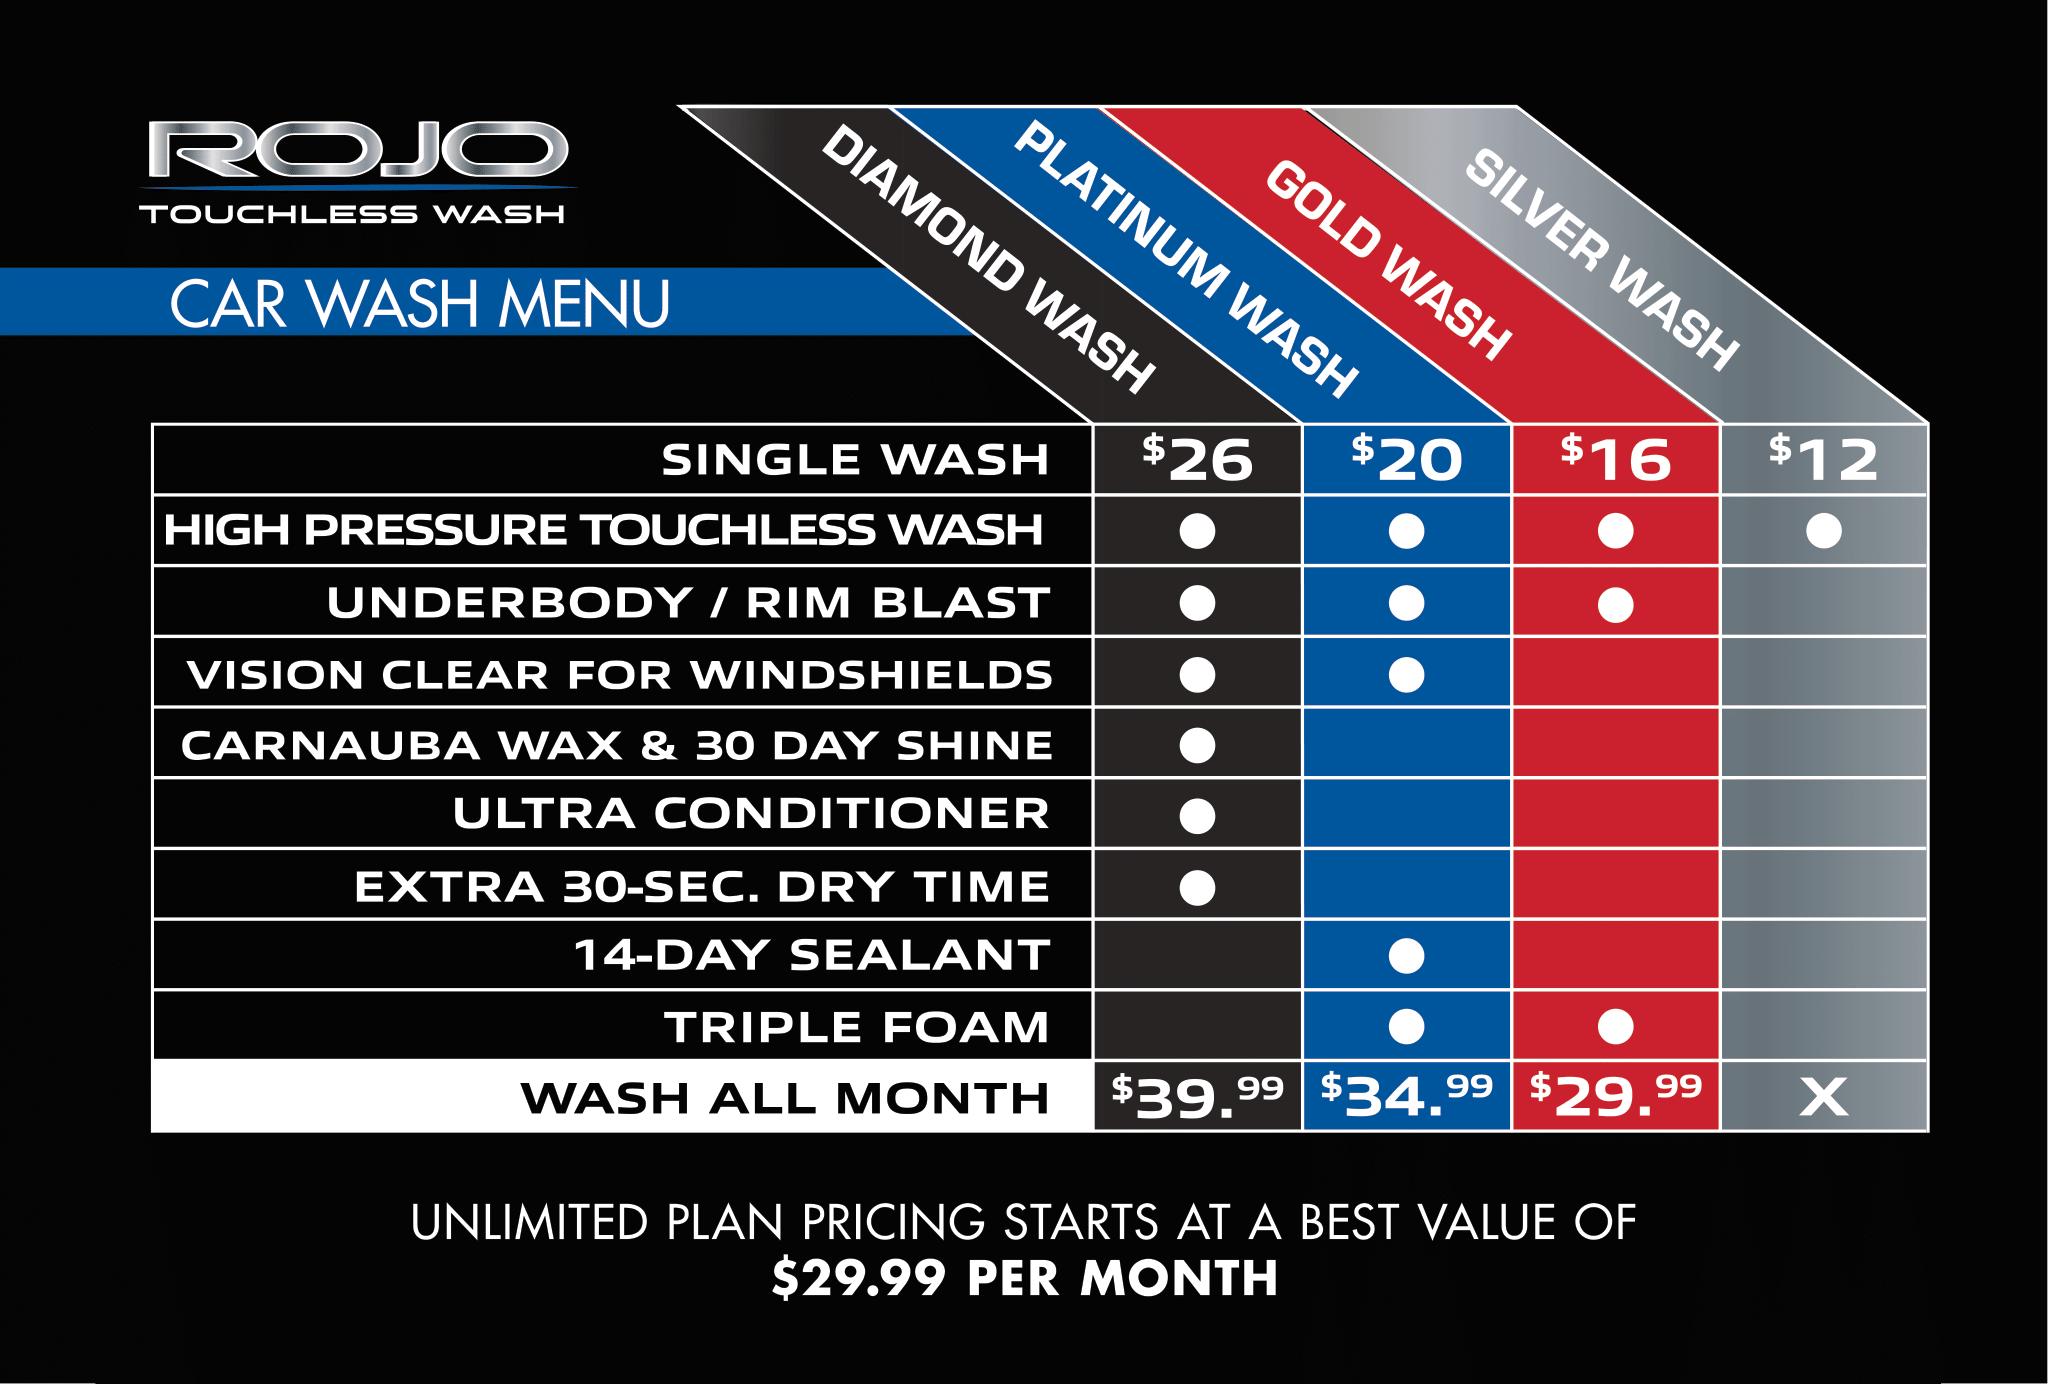 Rojo Exterior Wash Car wash Menu